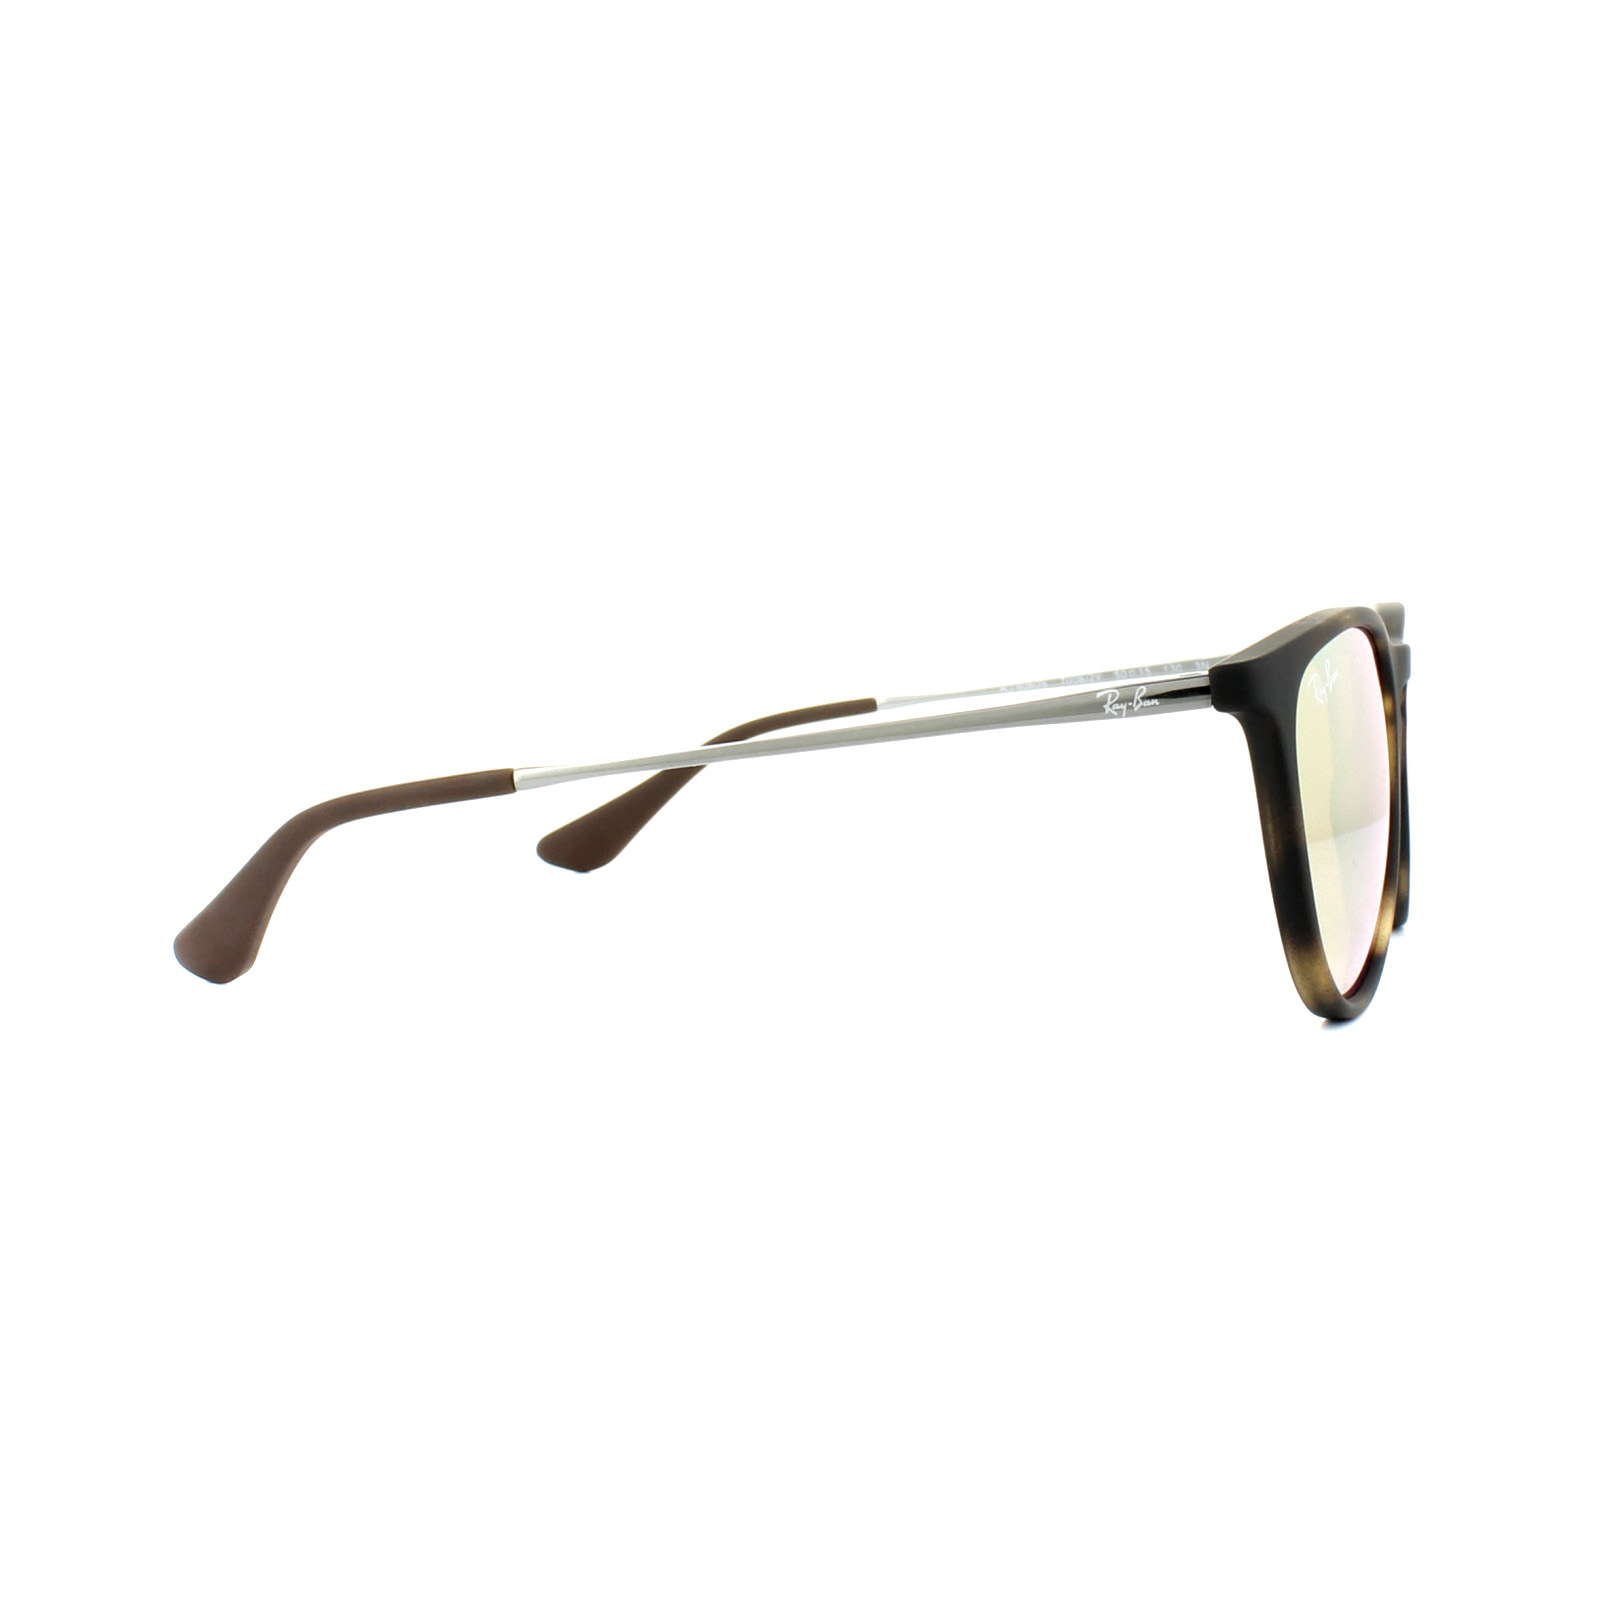 f58366a3a3 Sentinel Ray-Ban Junior Sunglasses Izzy 9060 70062Y Havana Gunmetal Copper  Mirror